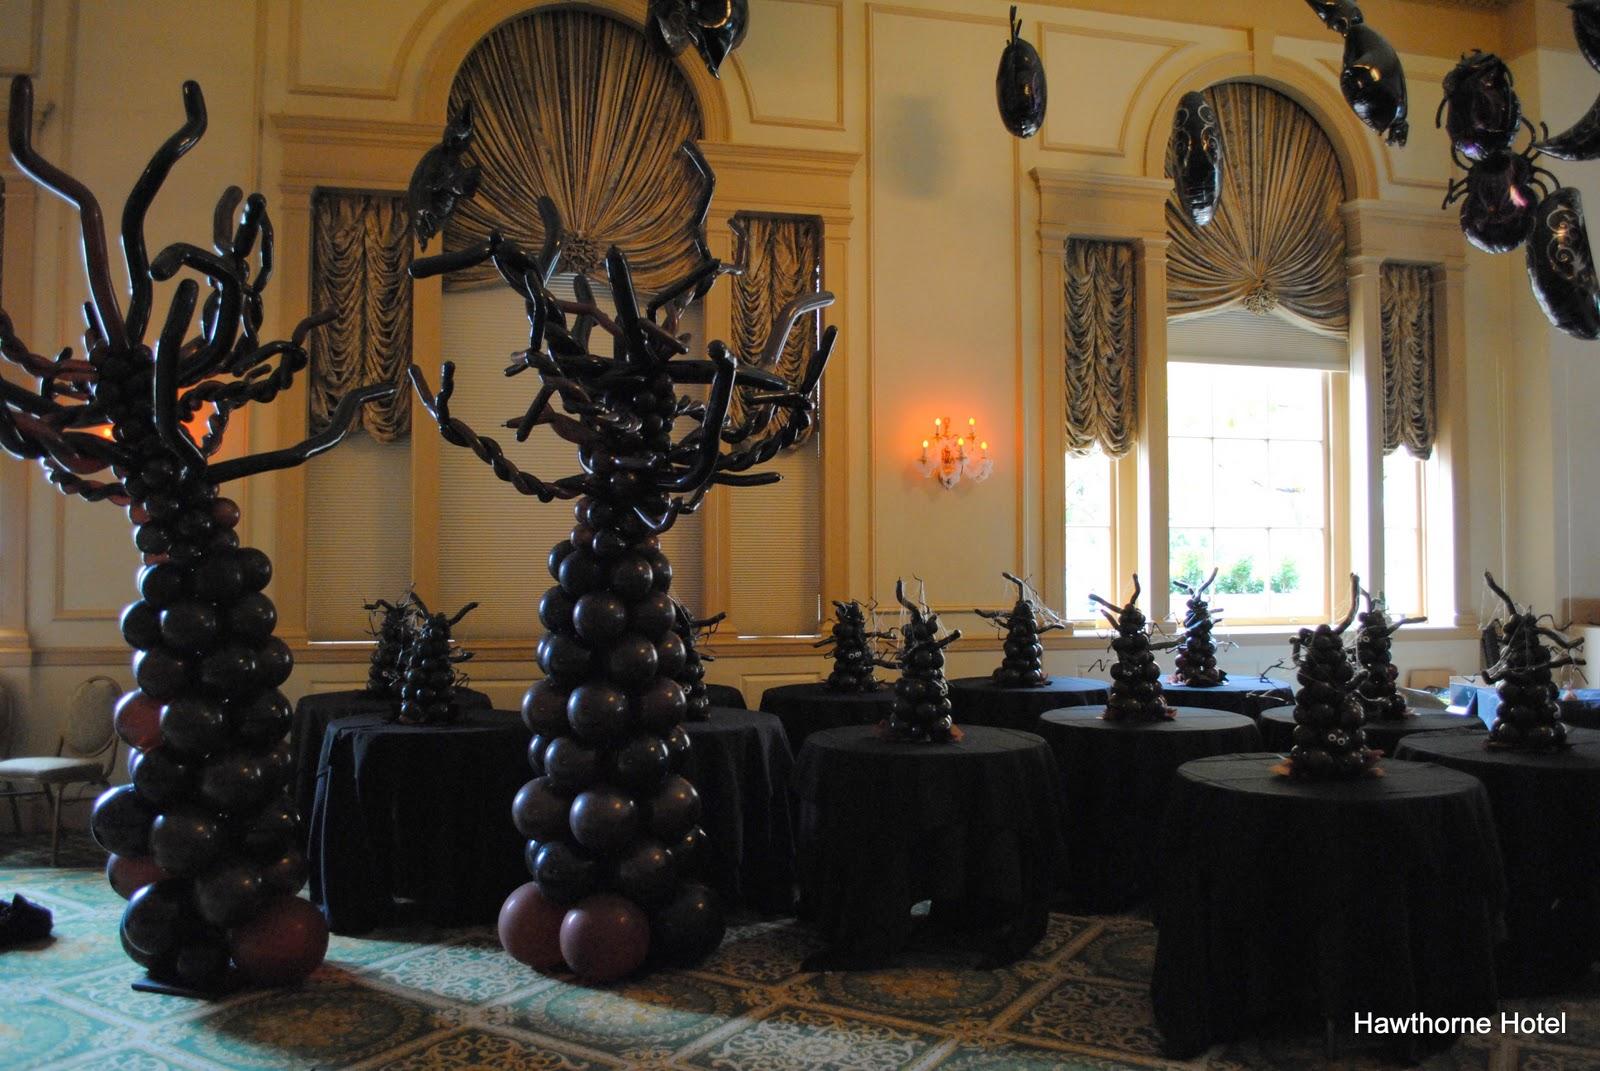 Hawthorne Hotel: October 2010